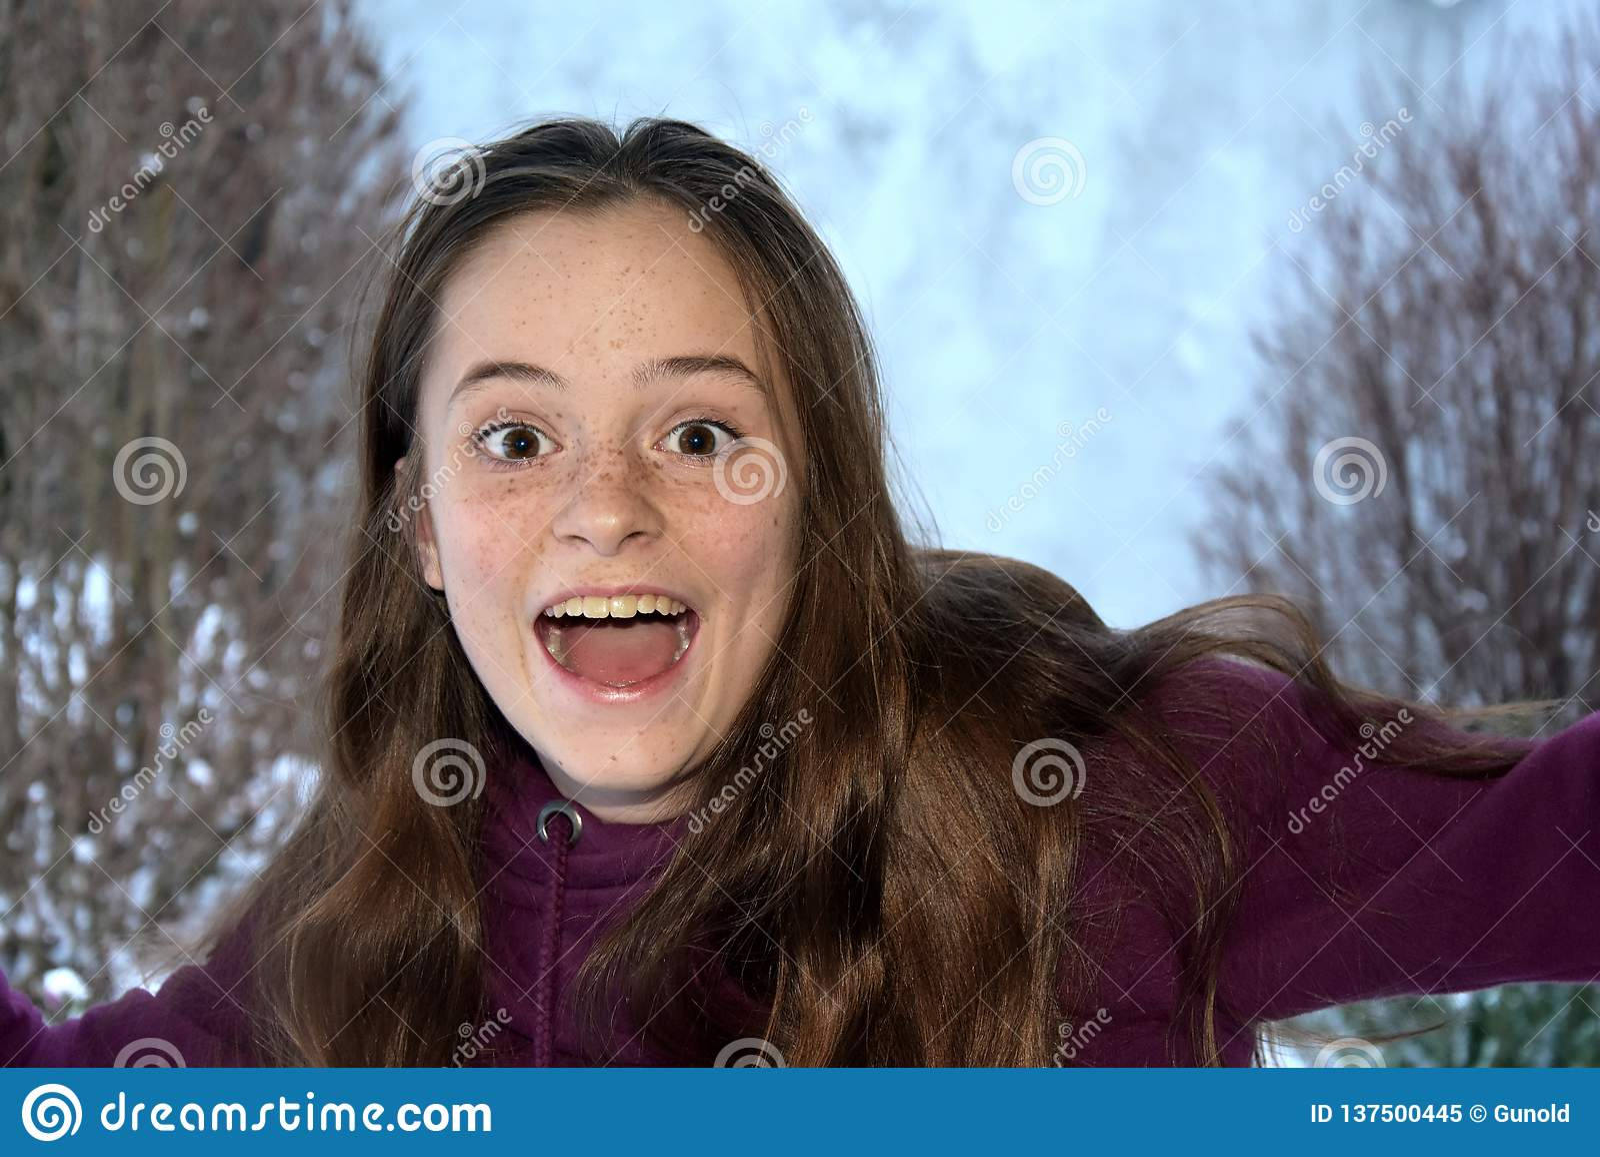 Cute teenage girl screams with joy